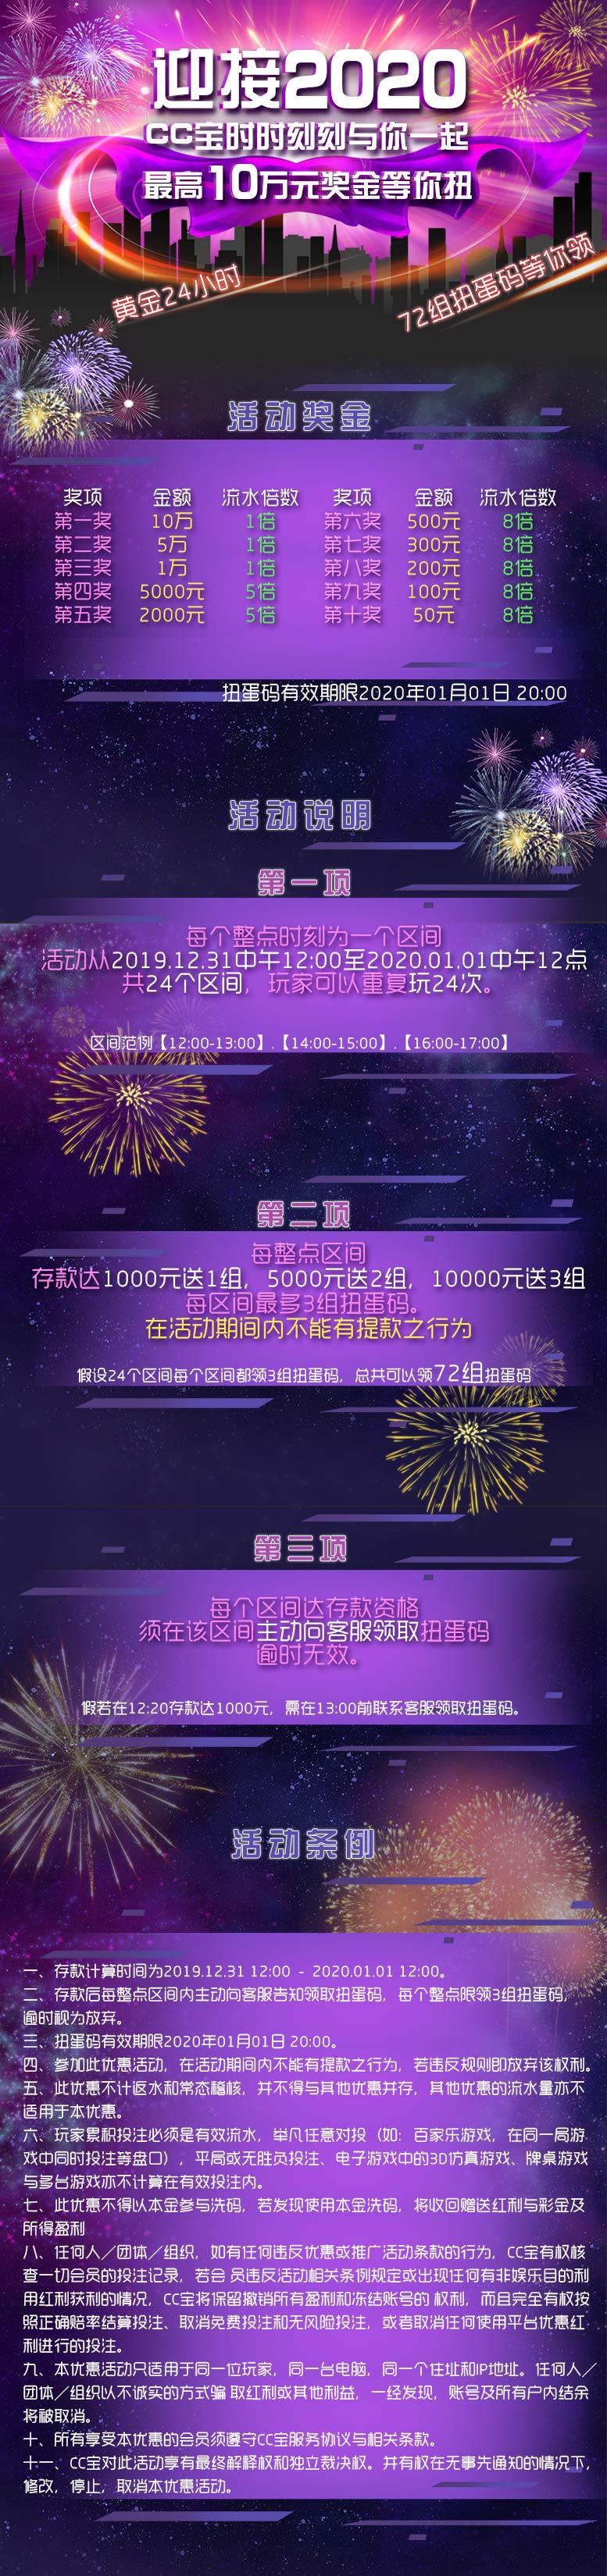 cc宝 cc集团 cc宝集团 北京赛车 赛车计画 香港六合彩 跨年 最高反水 送钱